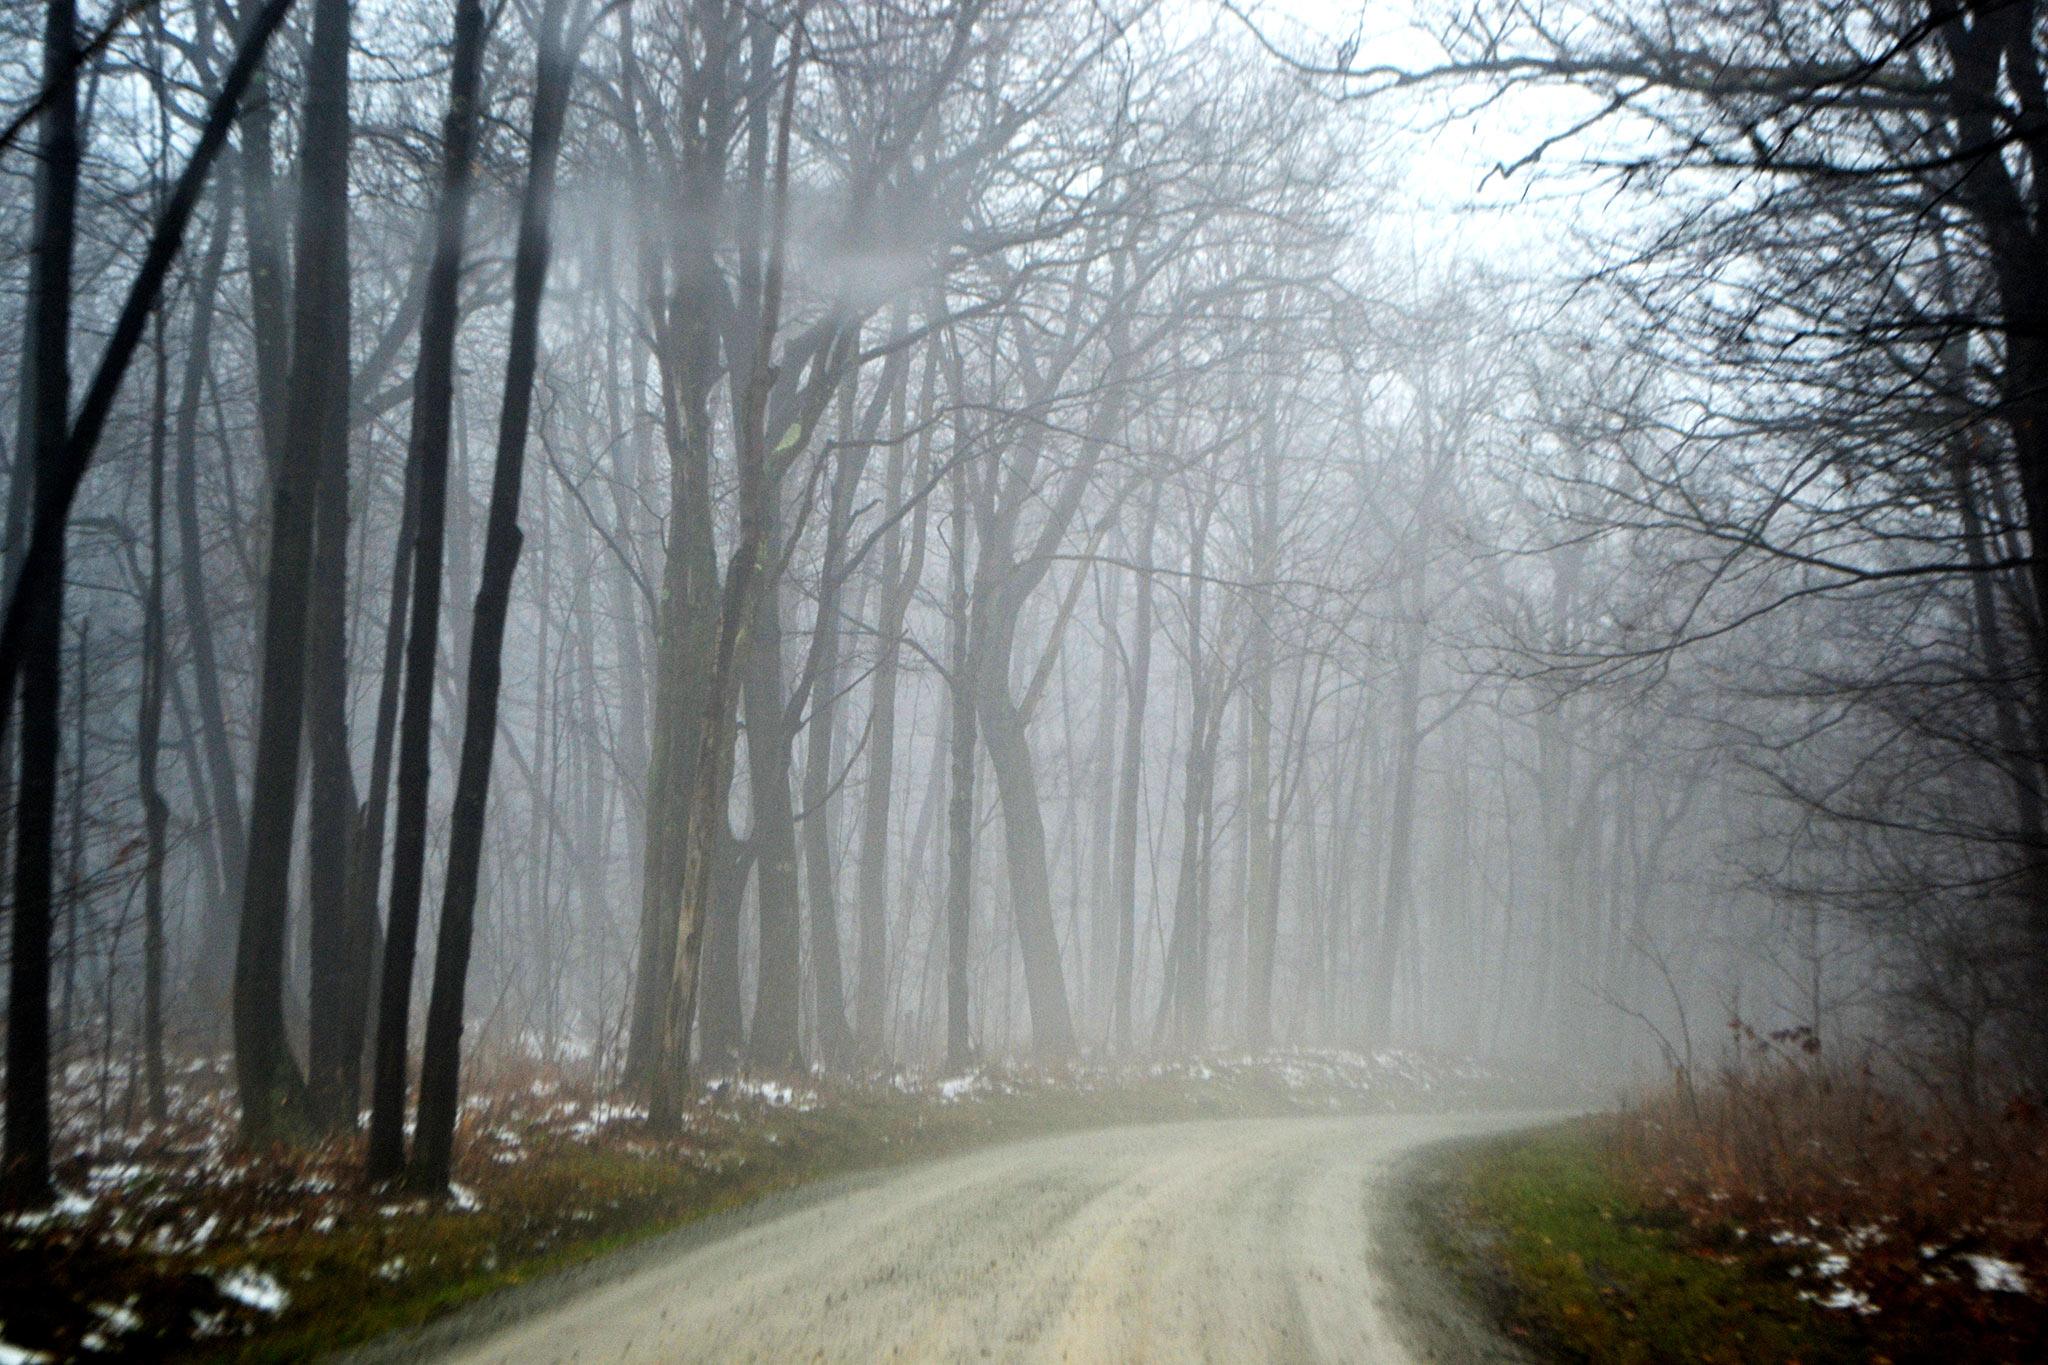 Laurel Highlands, south-western Pennsylvania